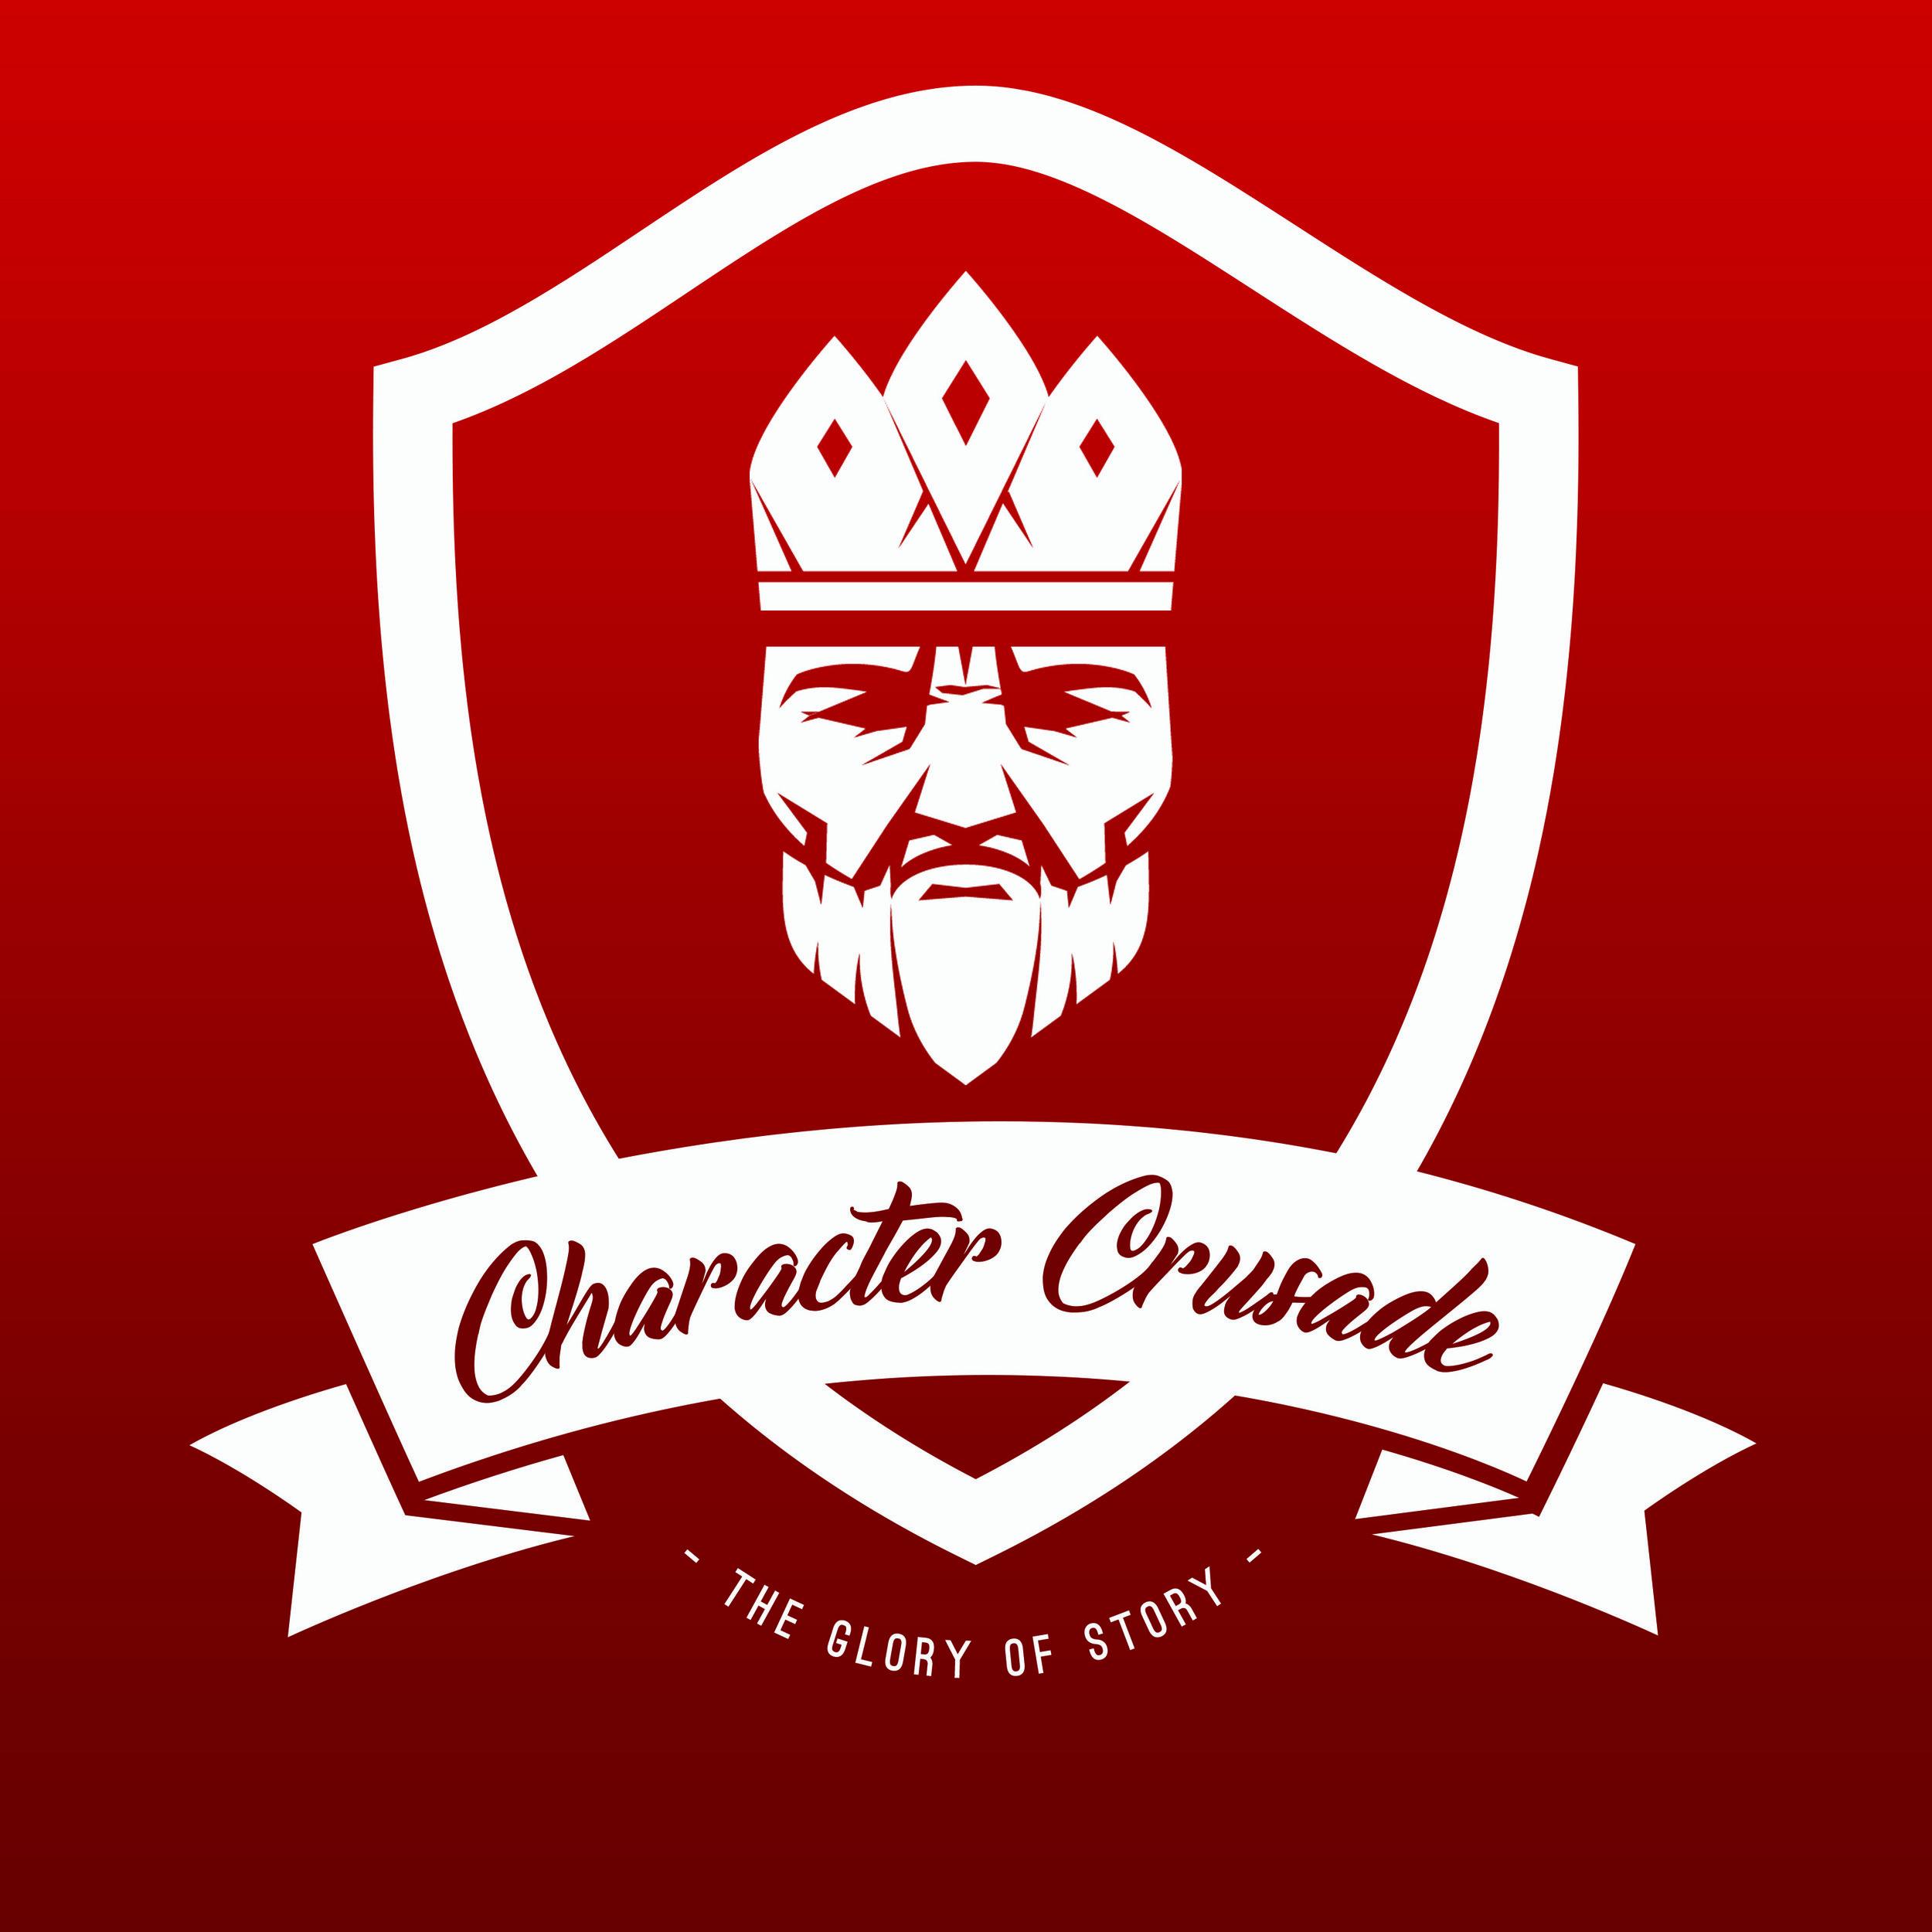 CC-logo-Red-Rev2.jpg